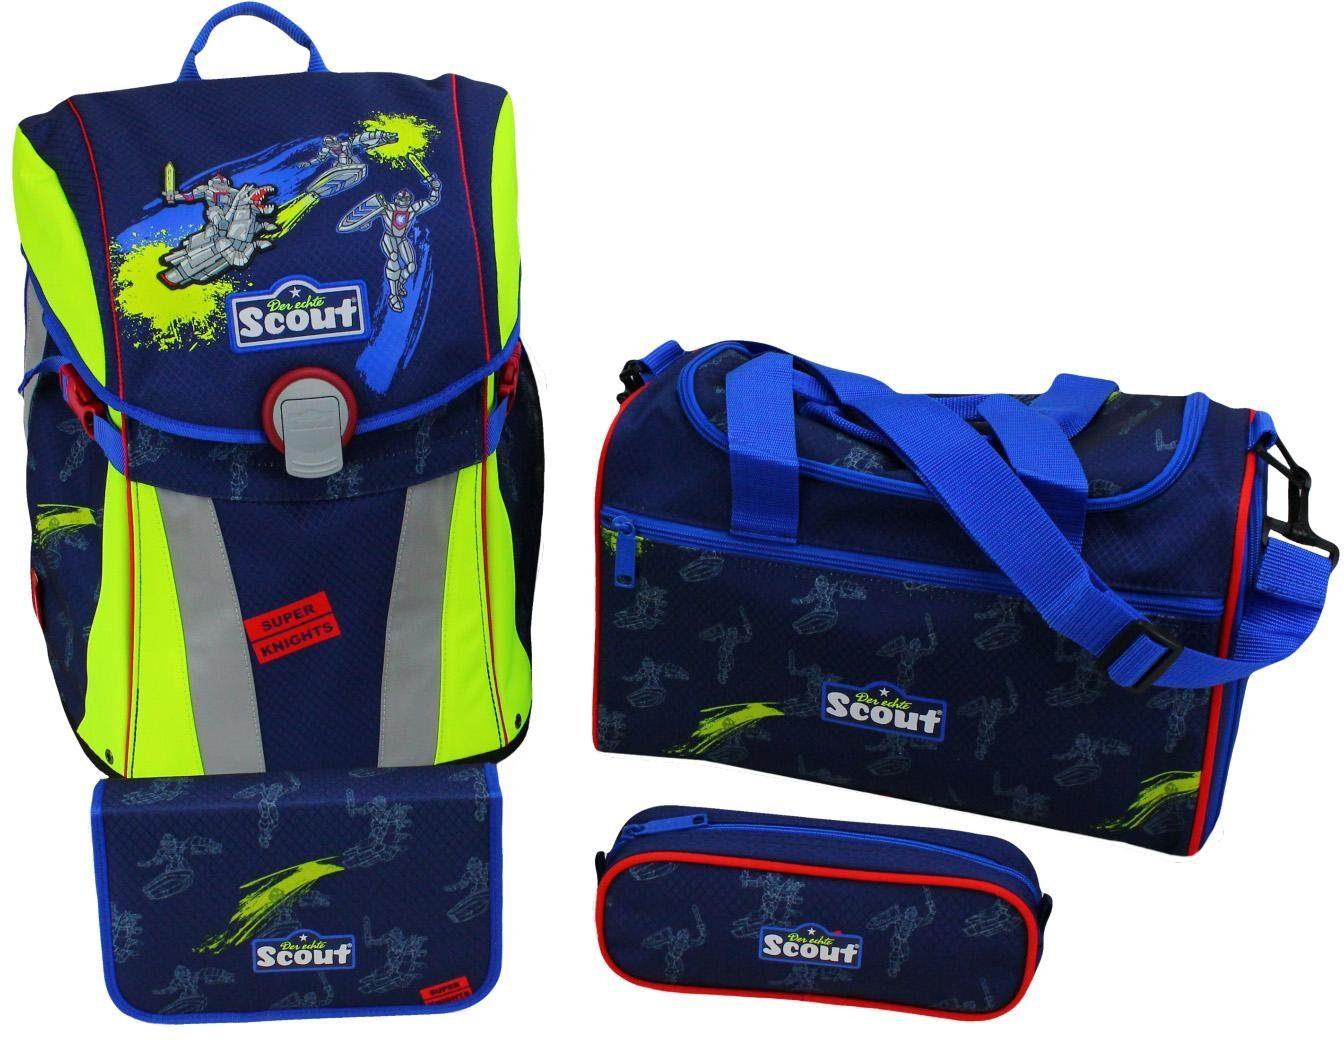 Scout Schulrucksack Set (4-tlg.), »Sunny, Super Knights«